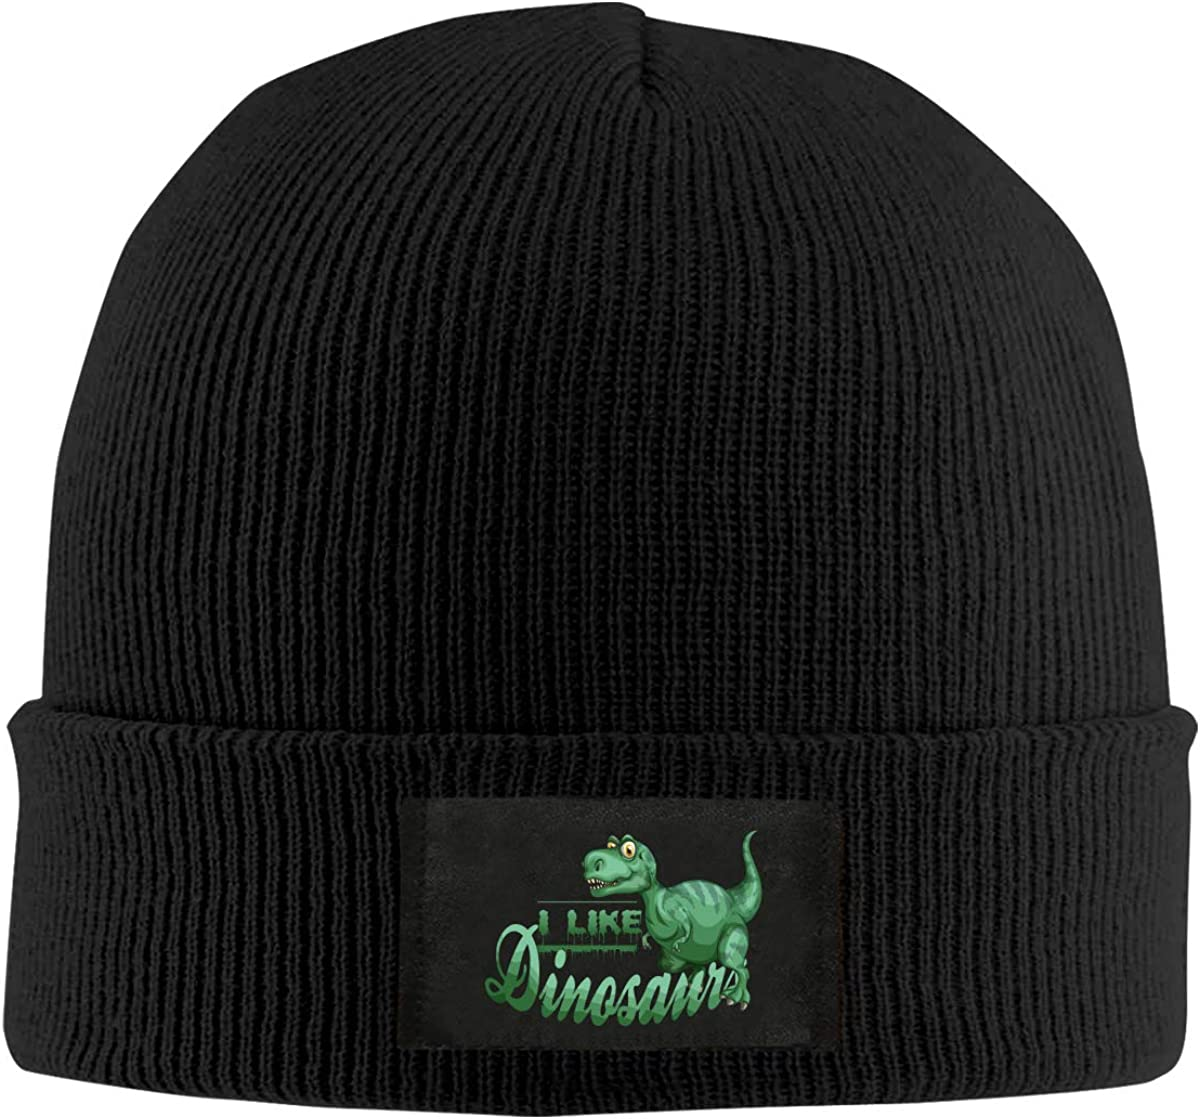 I Love Dinosaurs Fall Winter Thanksgiving Mens Beanies Cap Soft Knit Hats